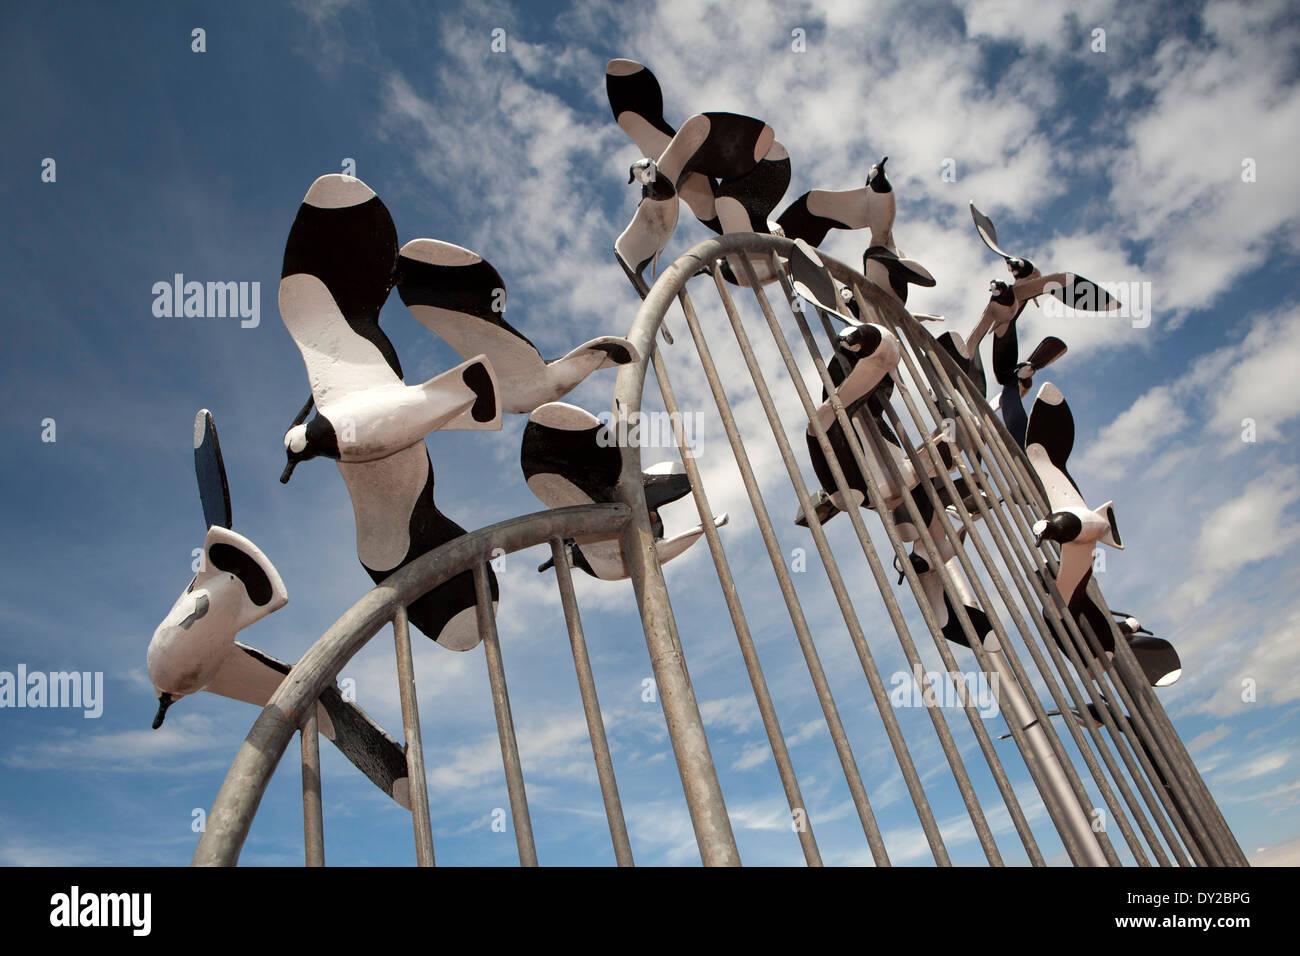 UK, England, Lancashire, Morecambe, Tern Project, 'parcel of oystercatchers' sculpture - Stock Image